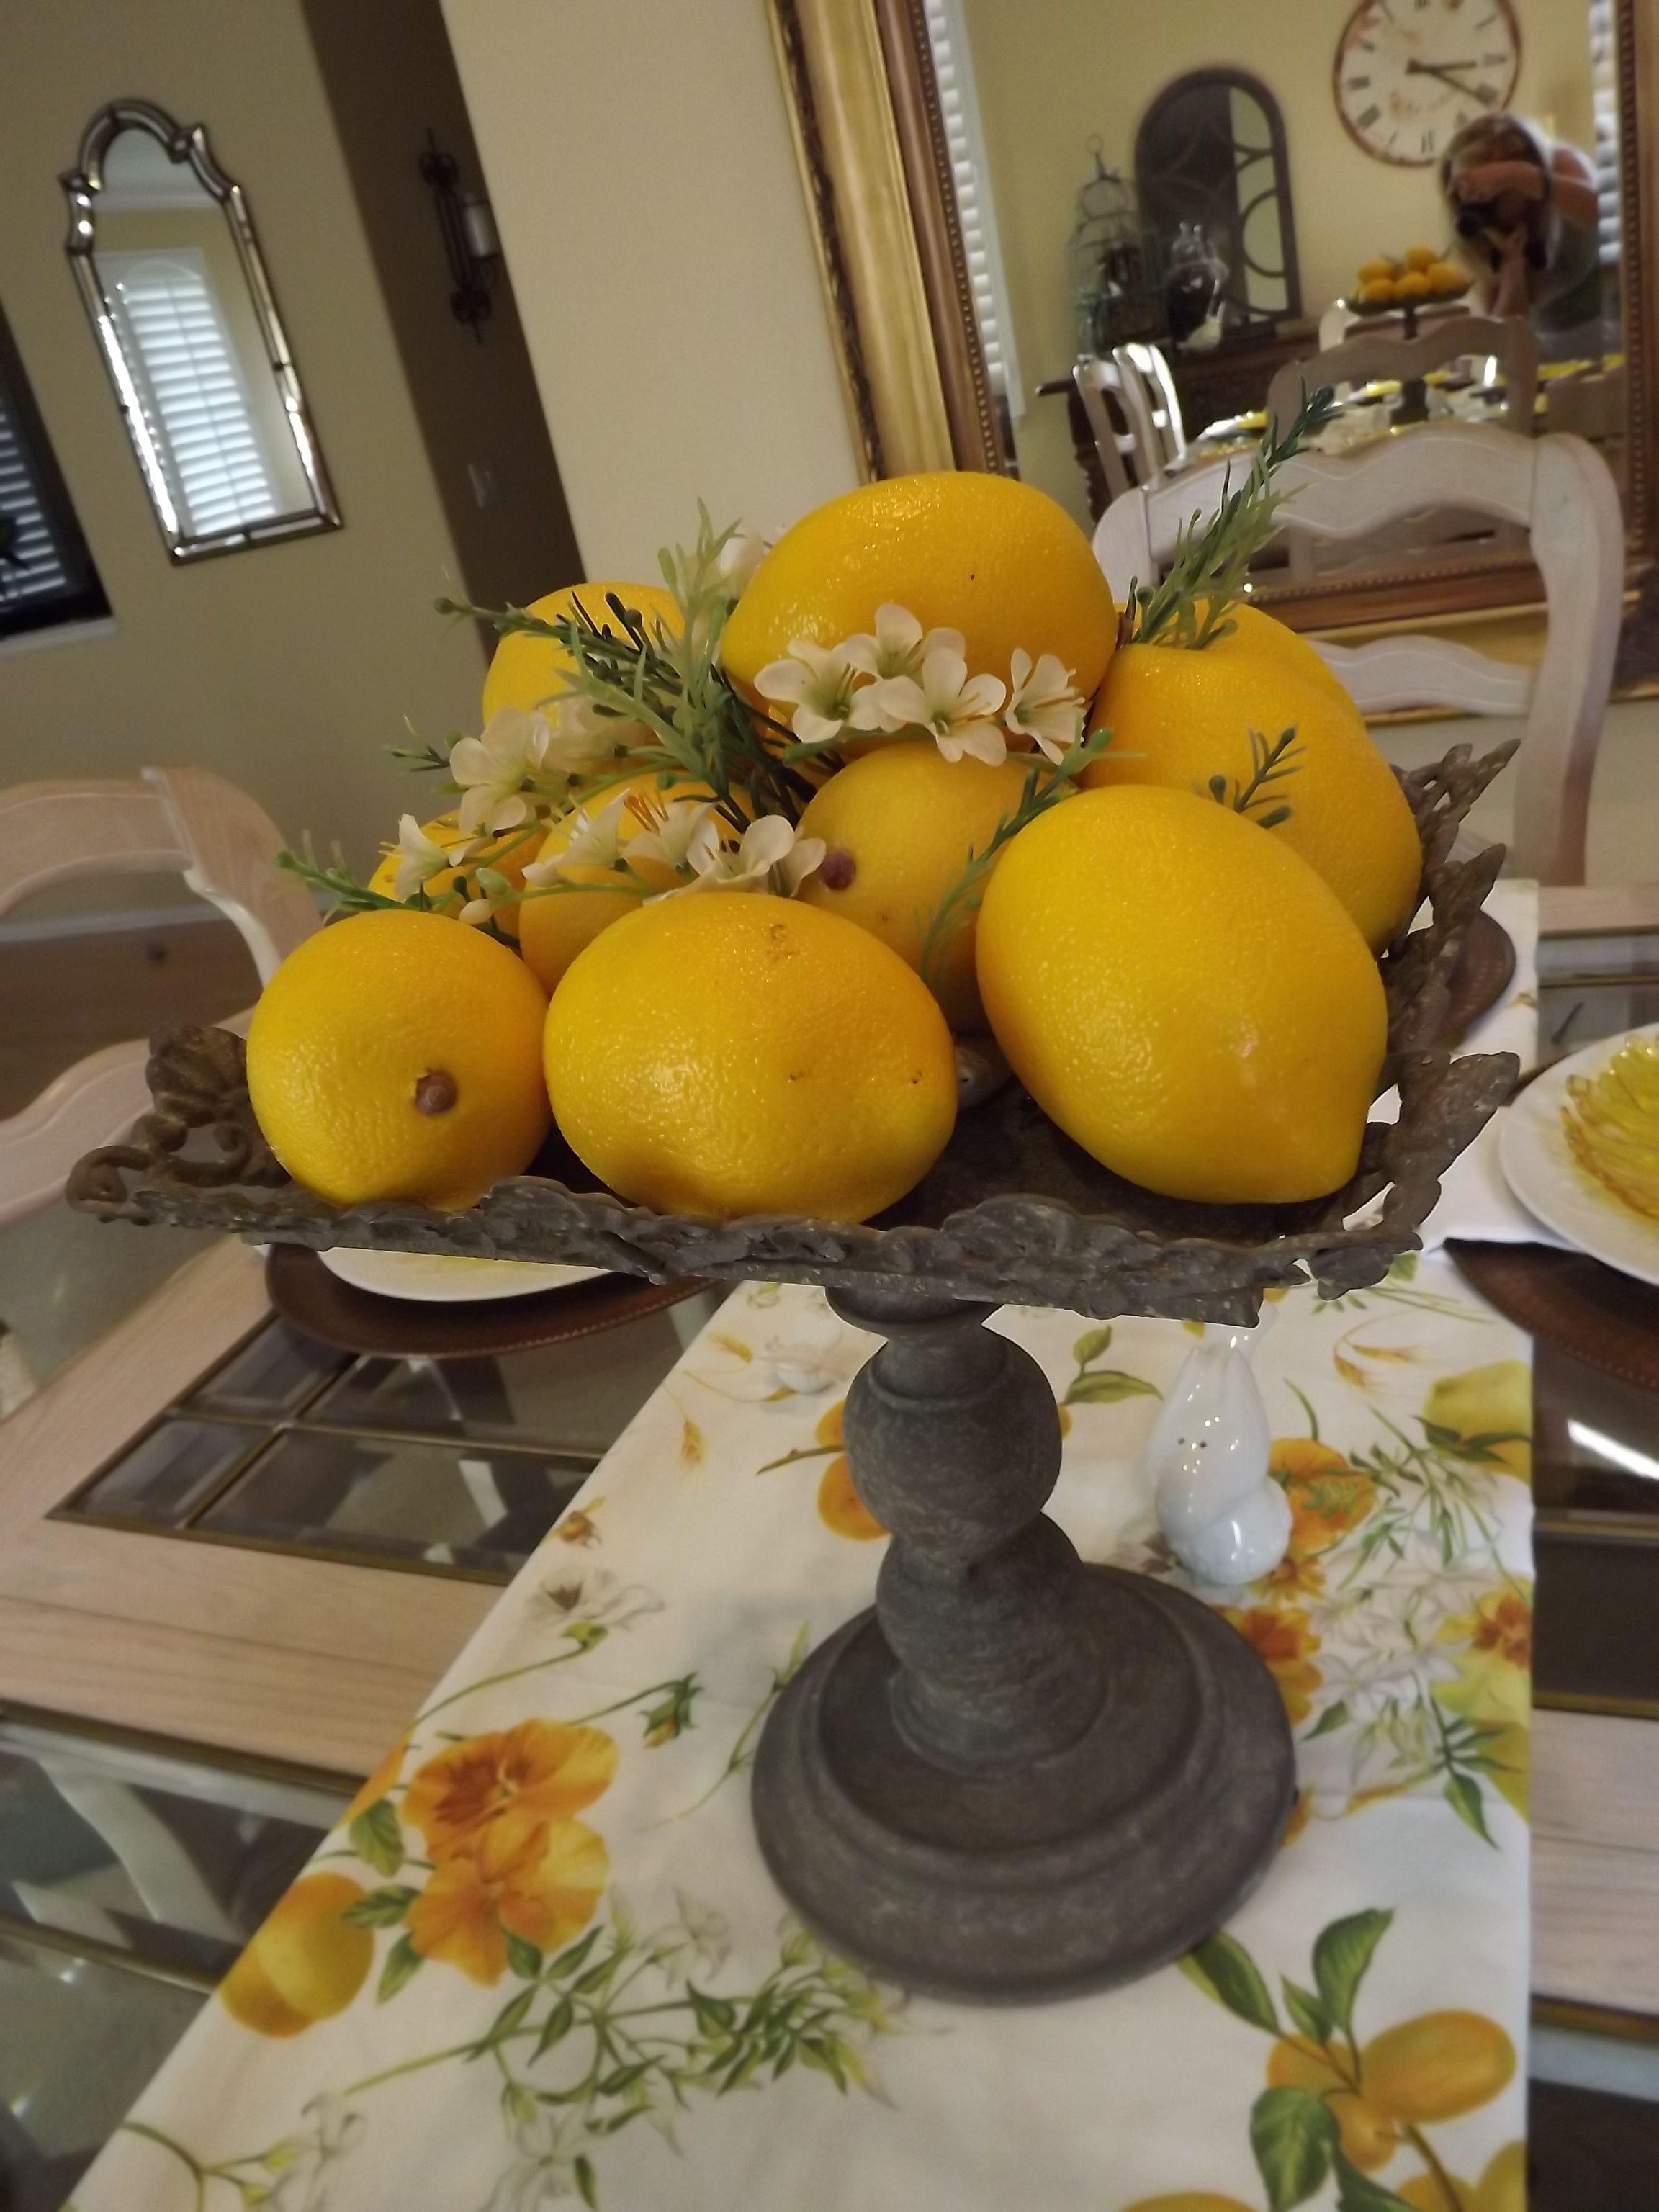 Lemons add a fresh, sunny  touch.